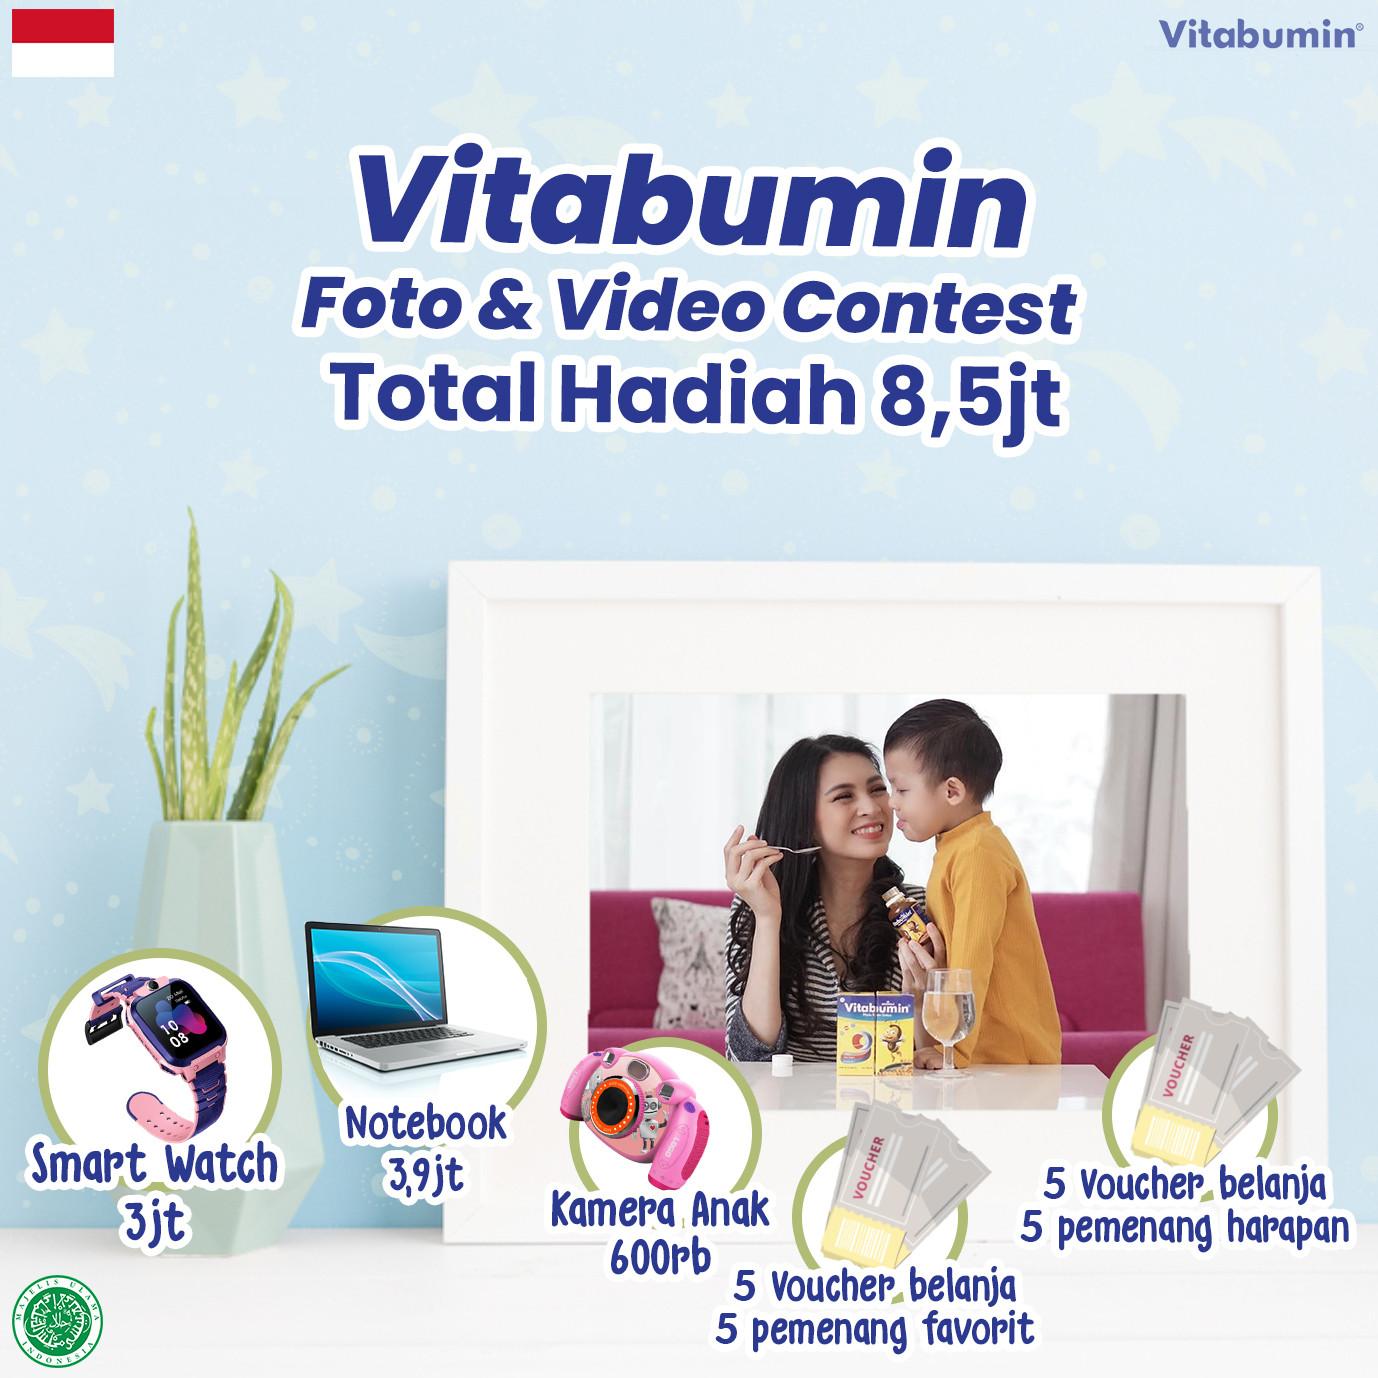 Vitabumin Foto & Video Contest #MerdekaDariStunting